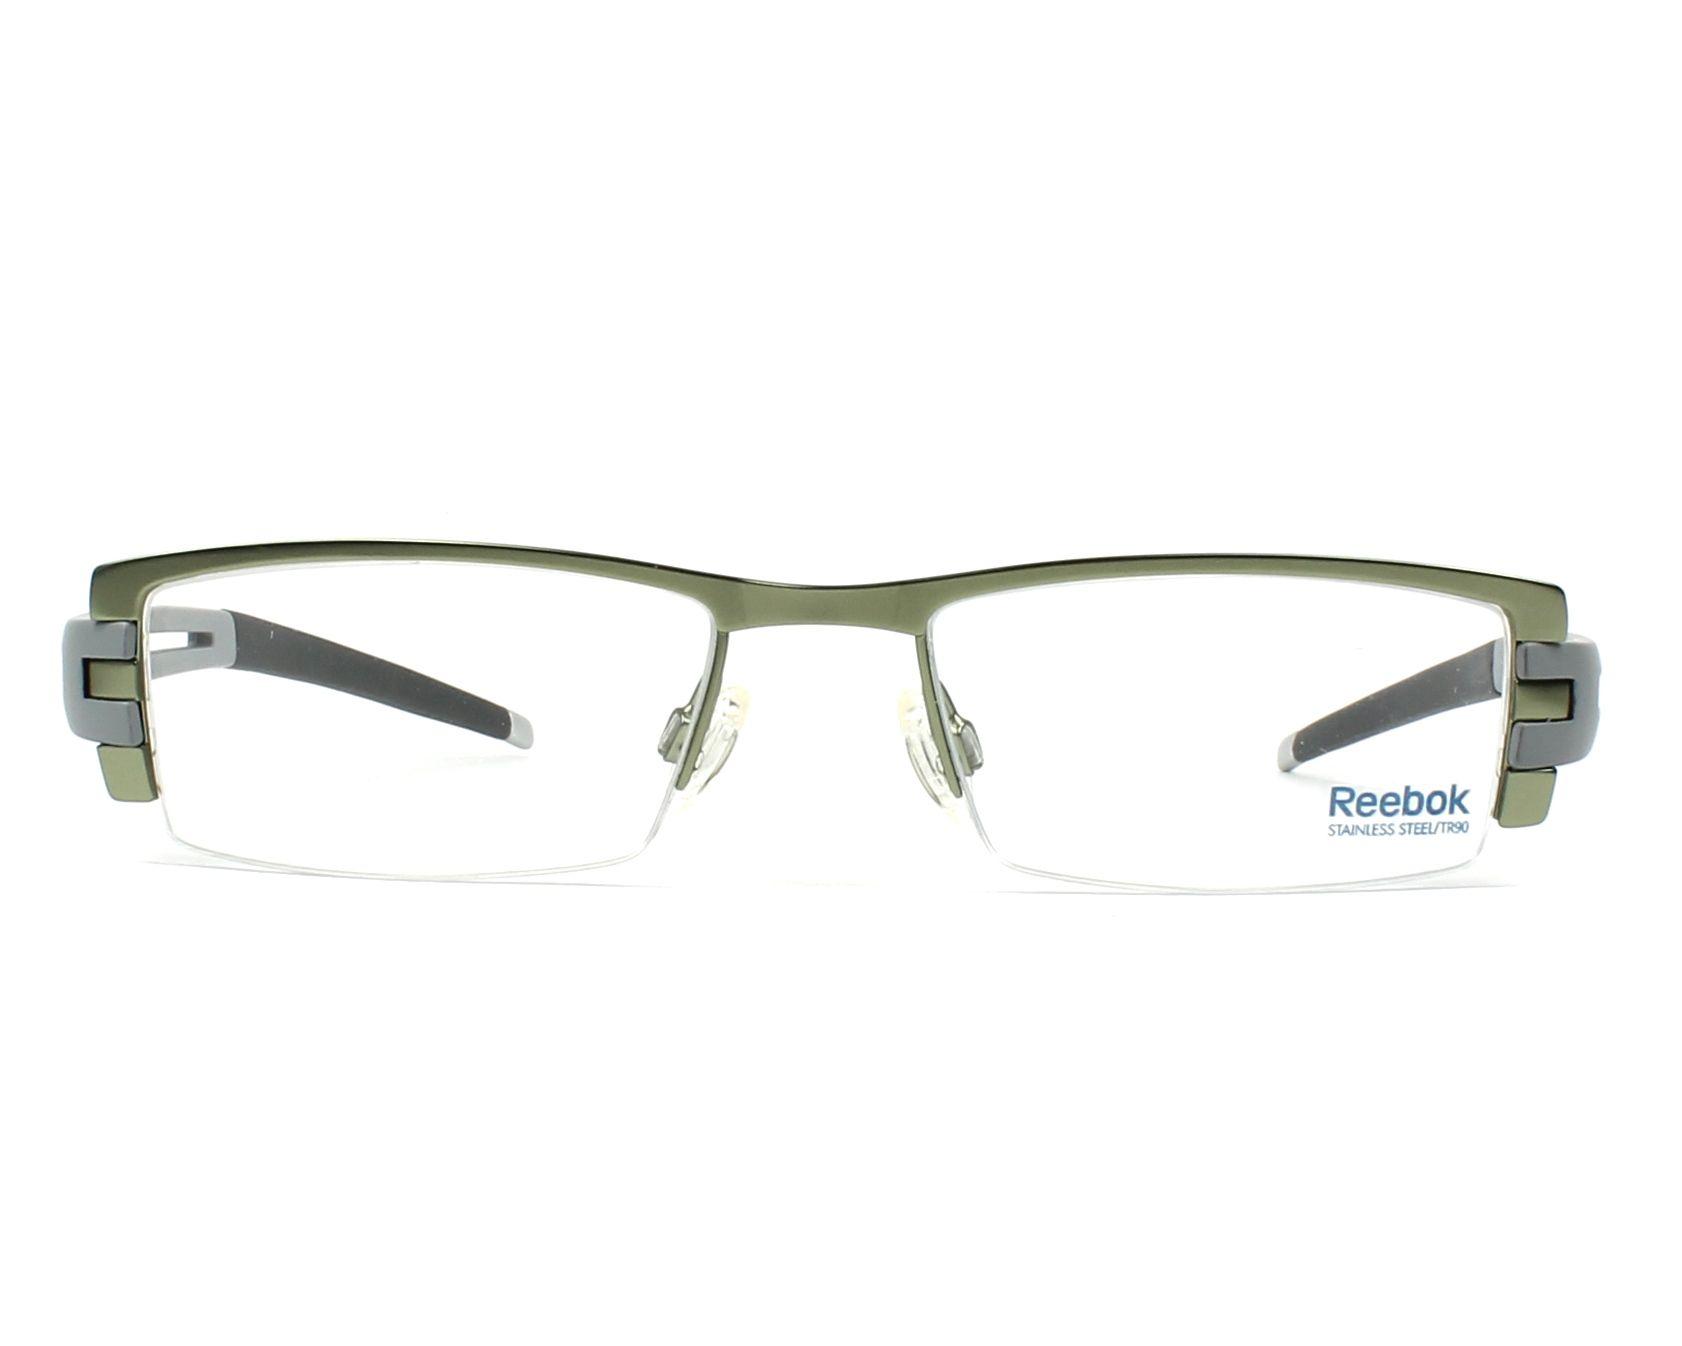 88f5fe05d1 Reebok Eyeglasses B-6081 Z Green